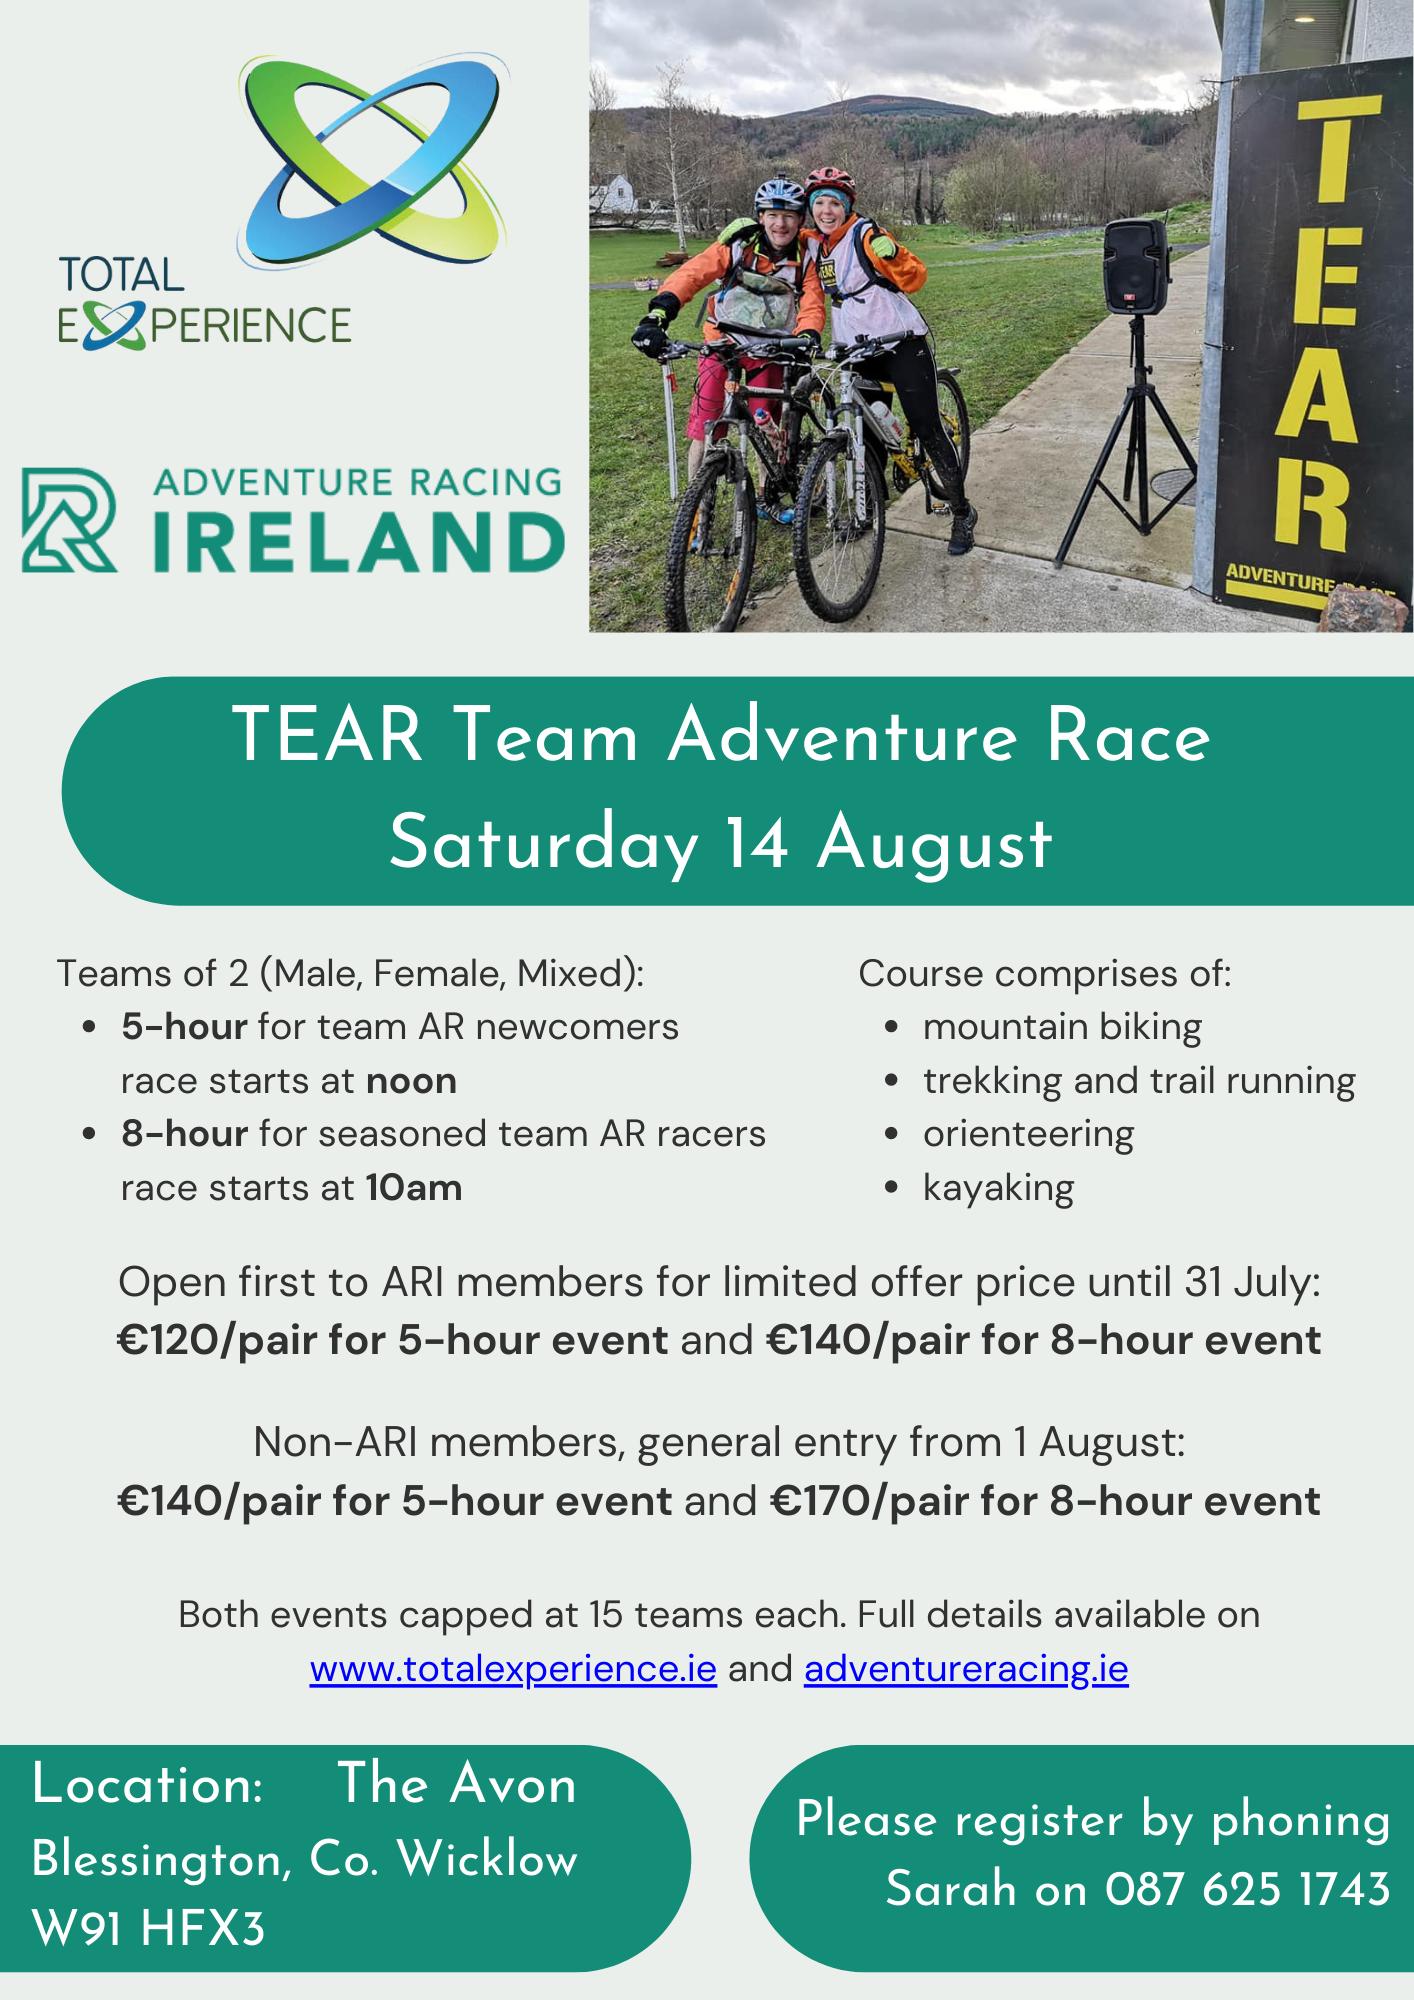 Image describing the TEAR adventure race